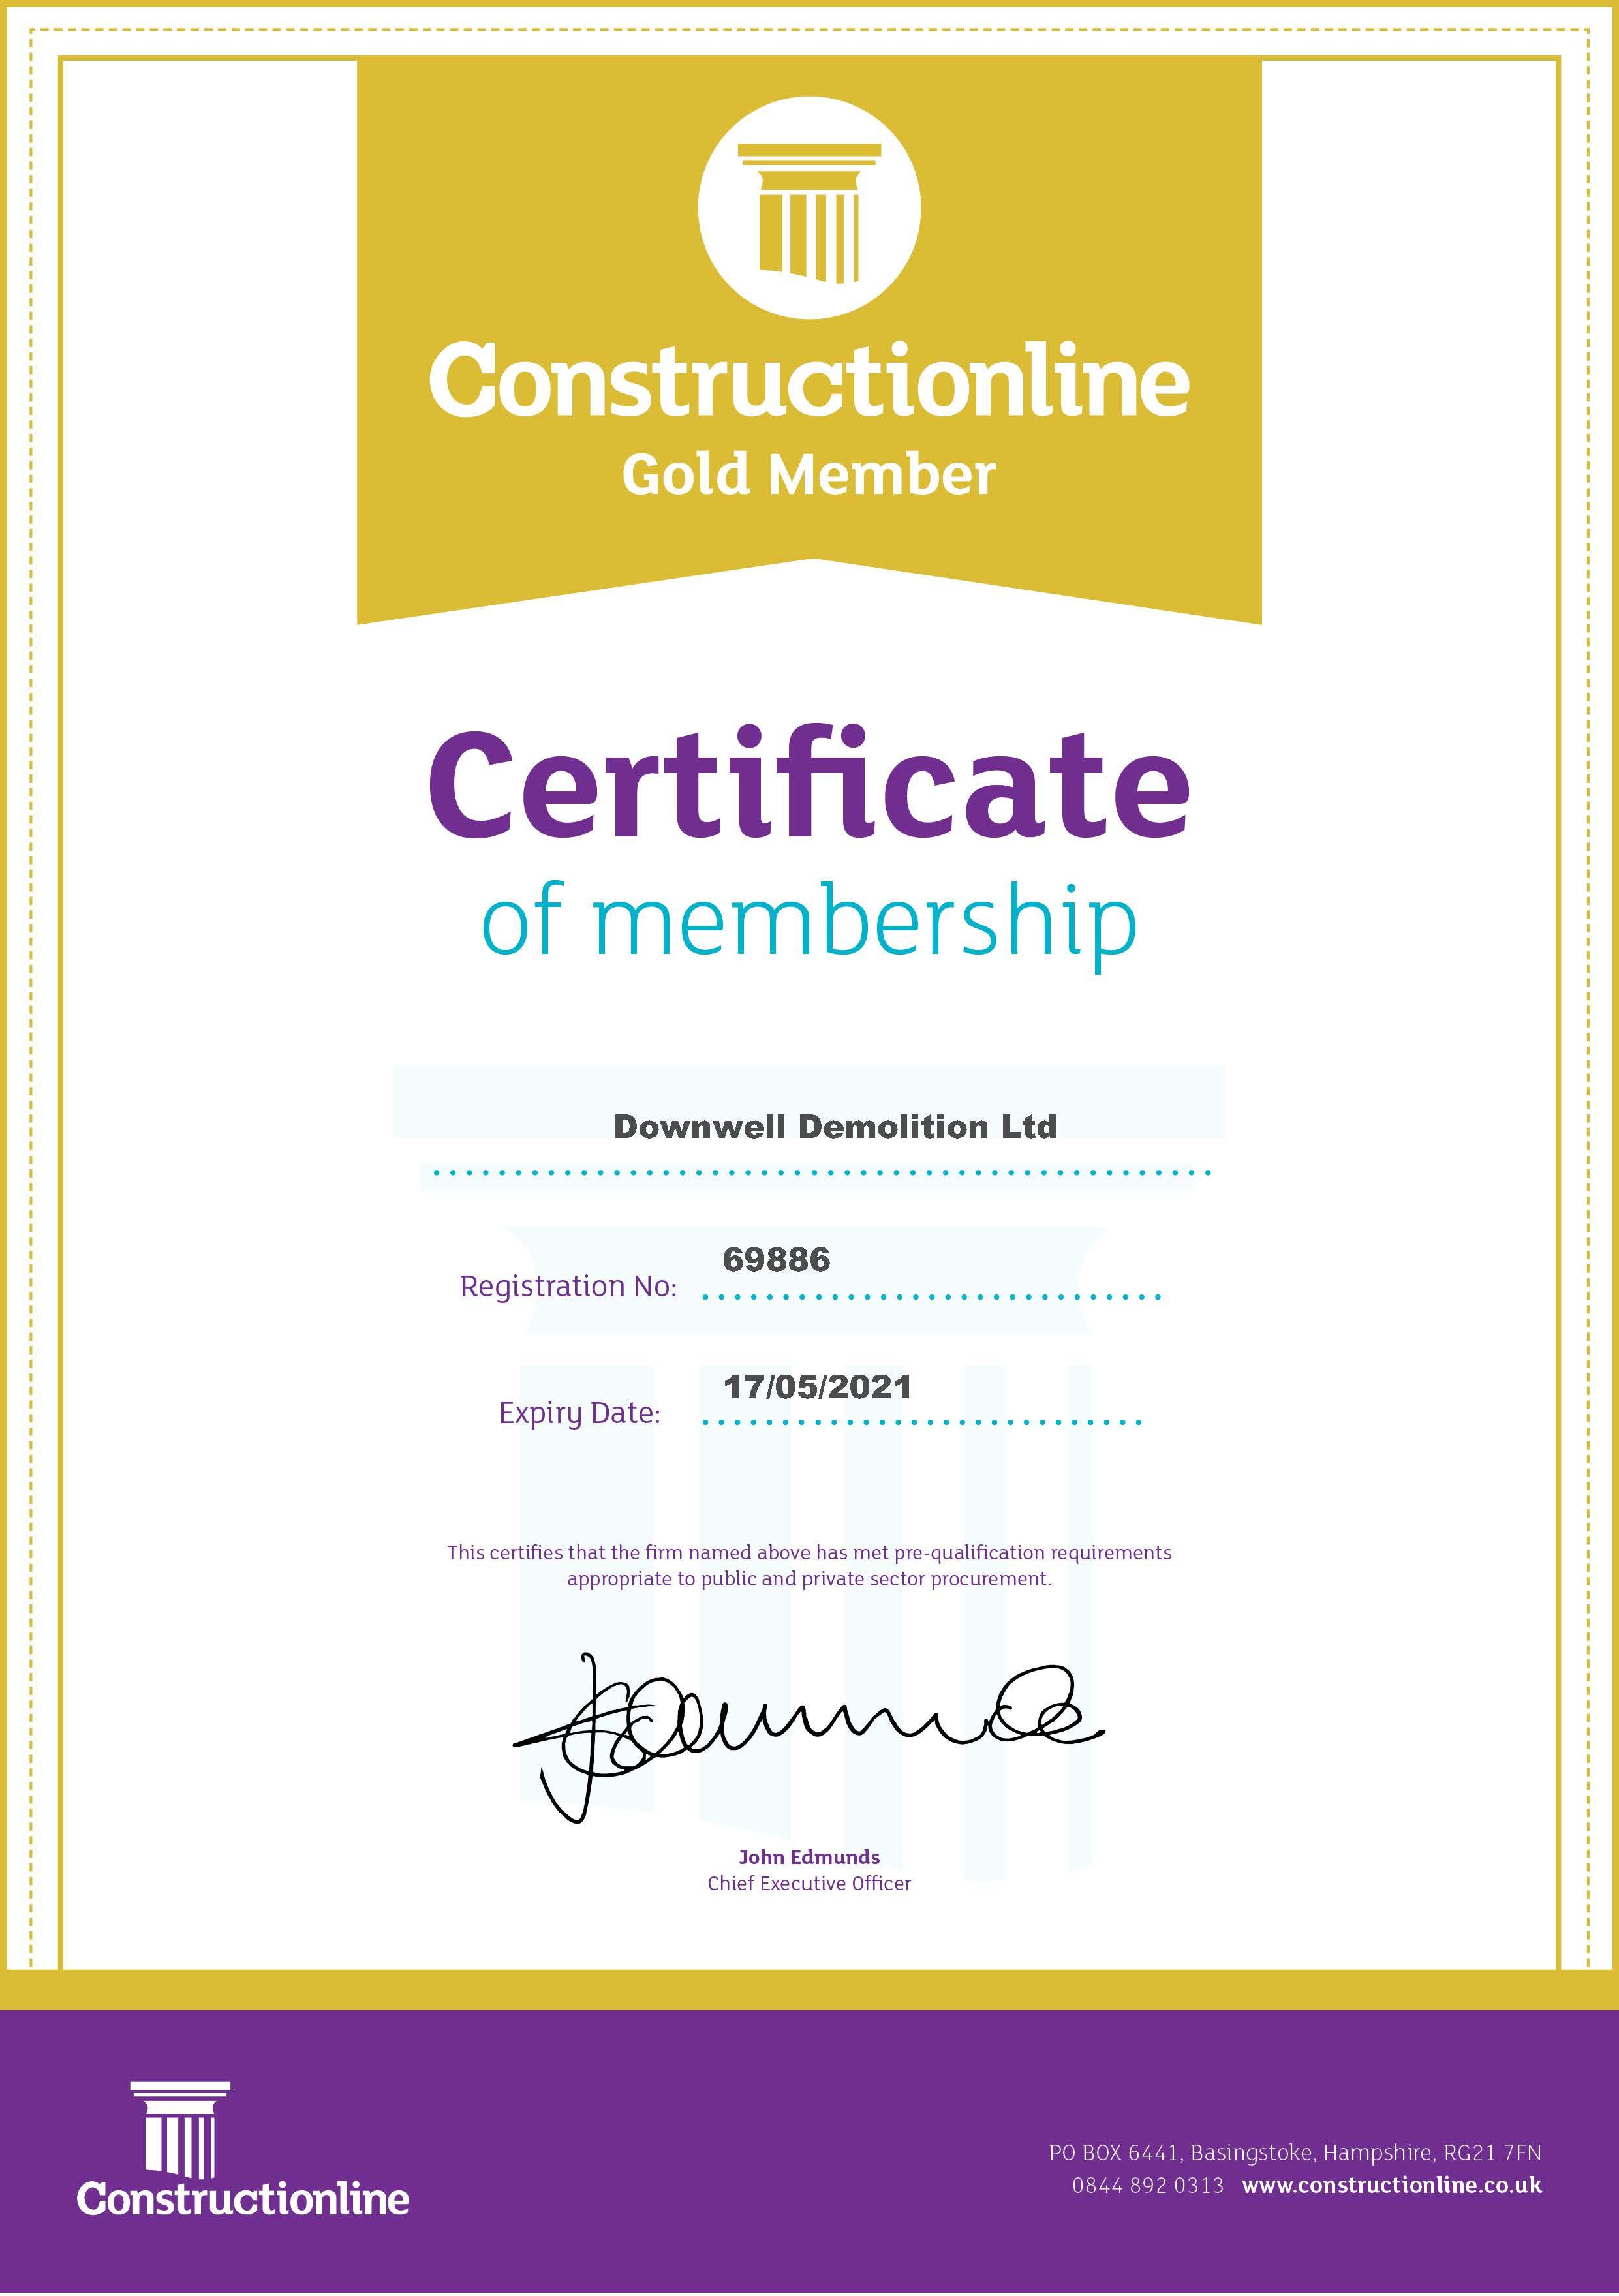 Constructionline Gold Certificate